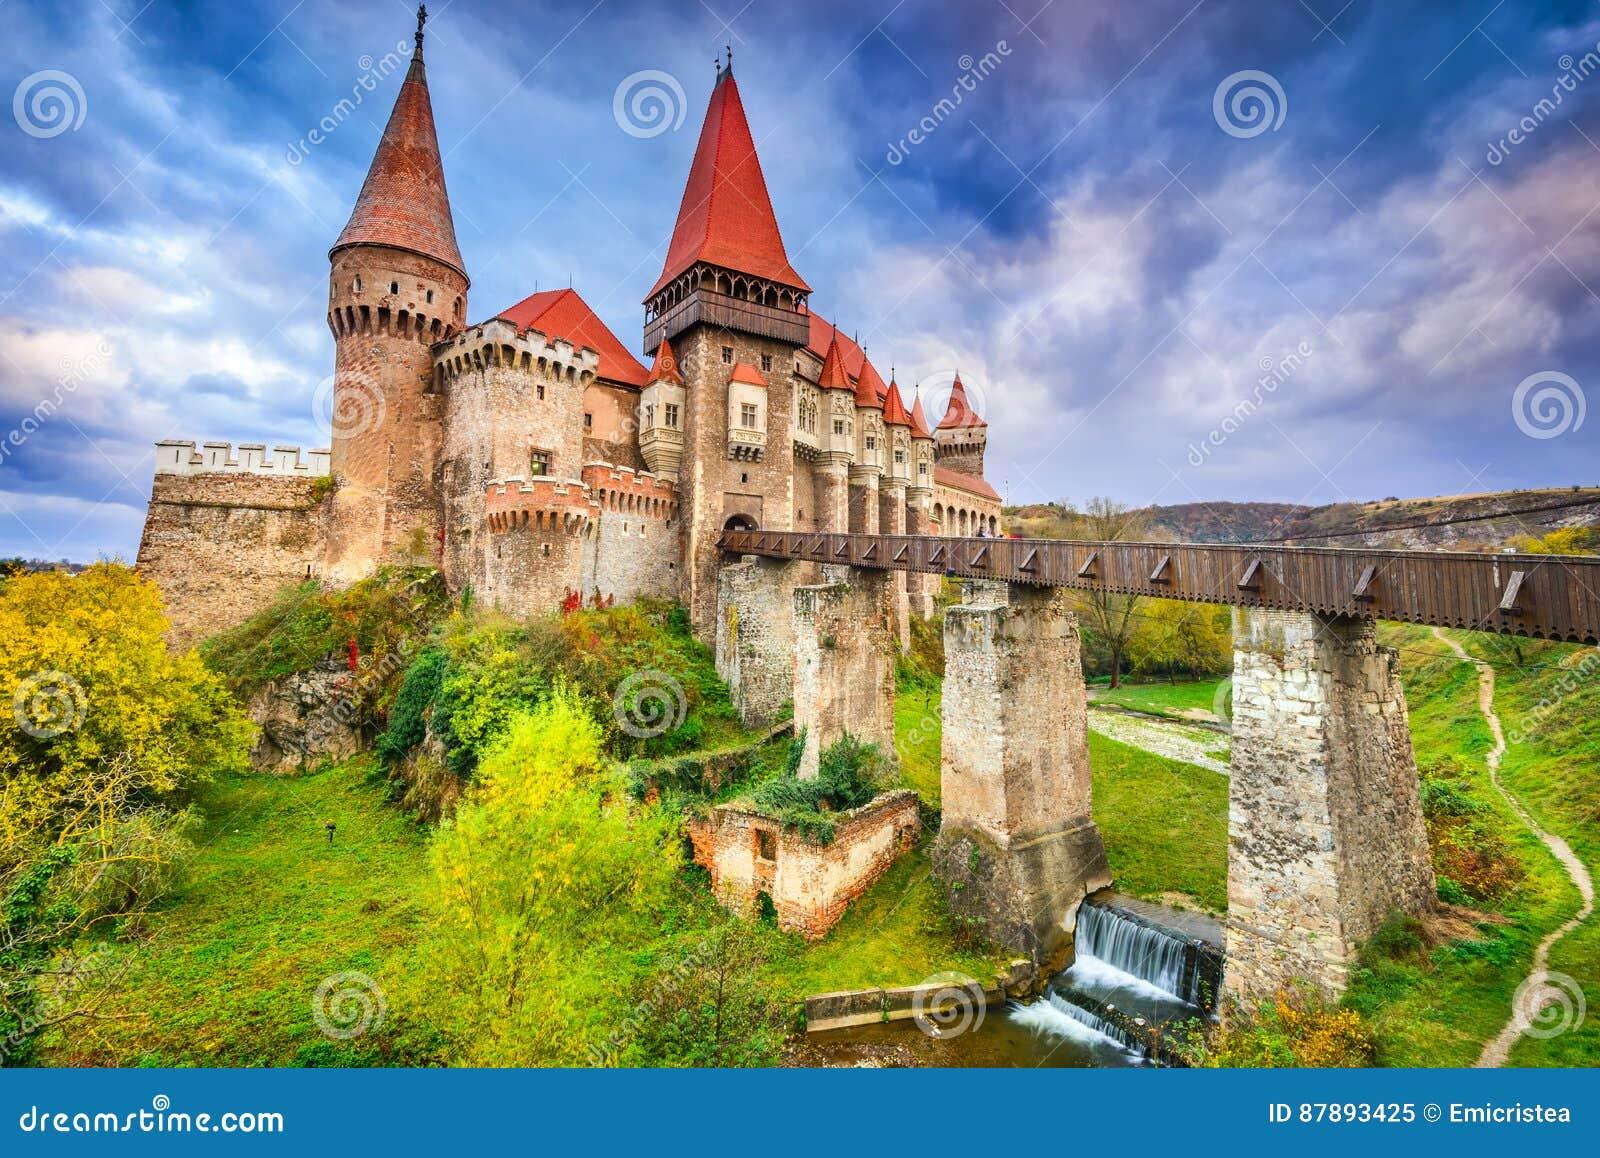 Château de Corvin - Hunedoara, la Transylvanie, Roumanie